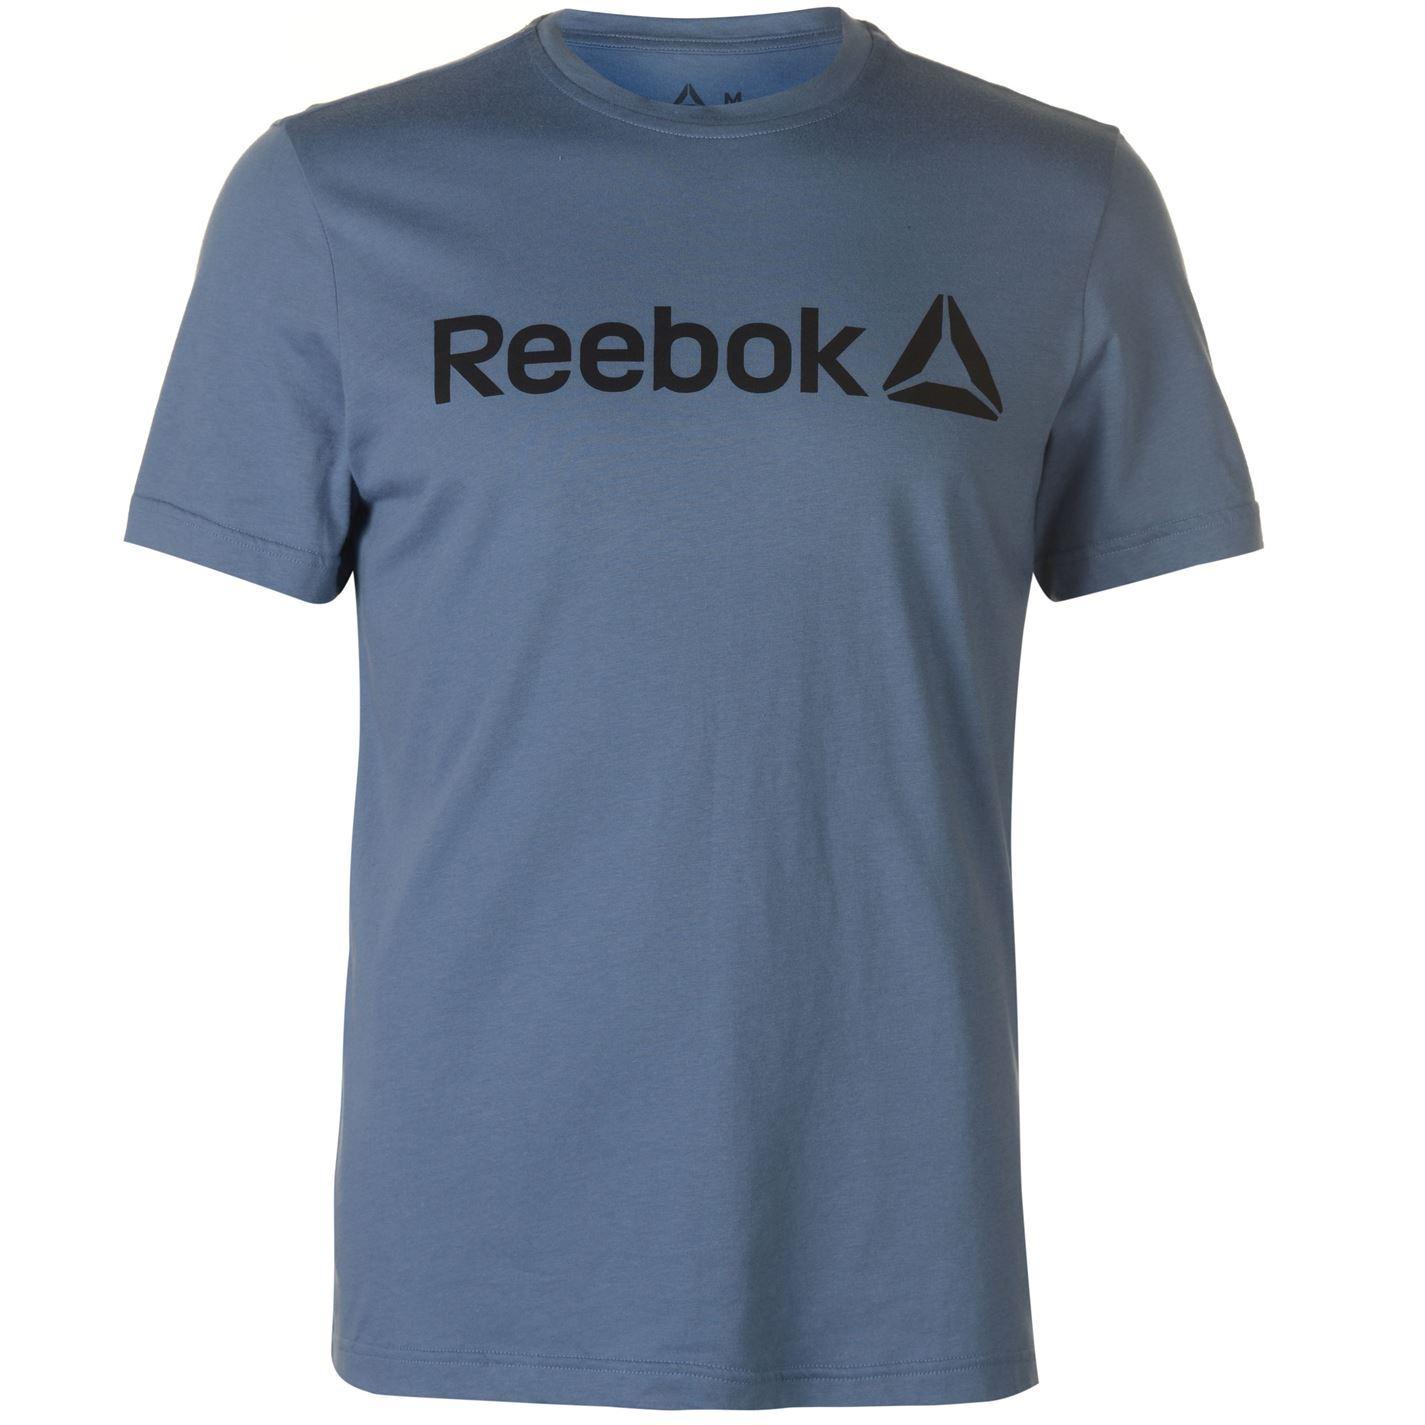 Reebok-Delta-Logo-T-Shirt-Mens-Tee-Shirt-Top thumbnail 13